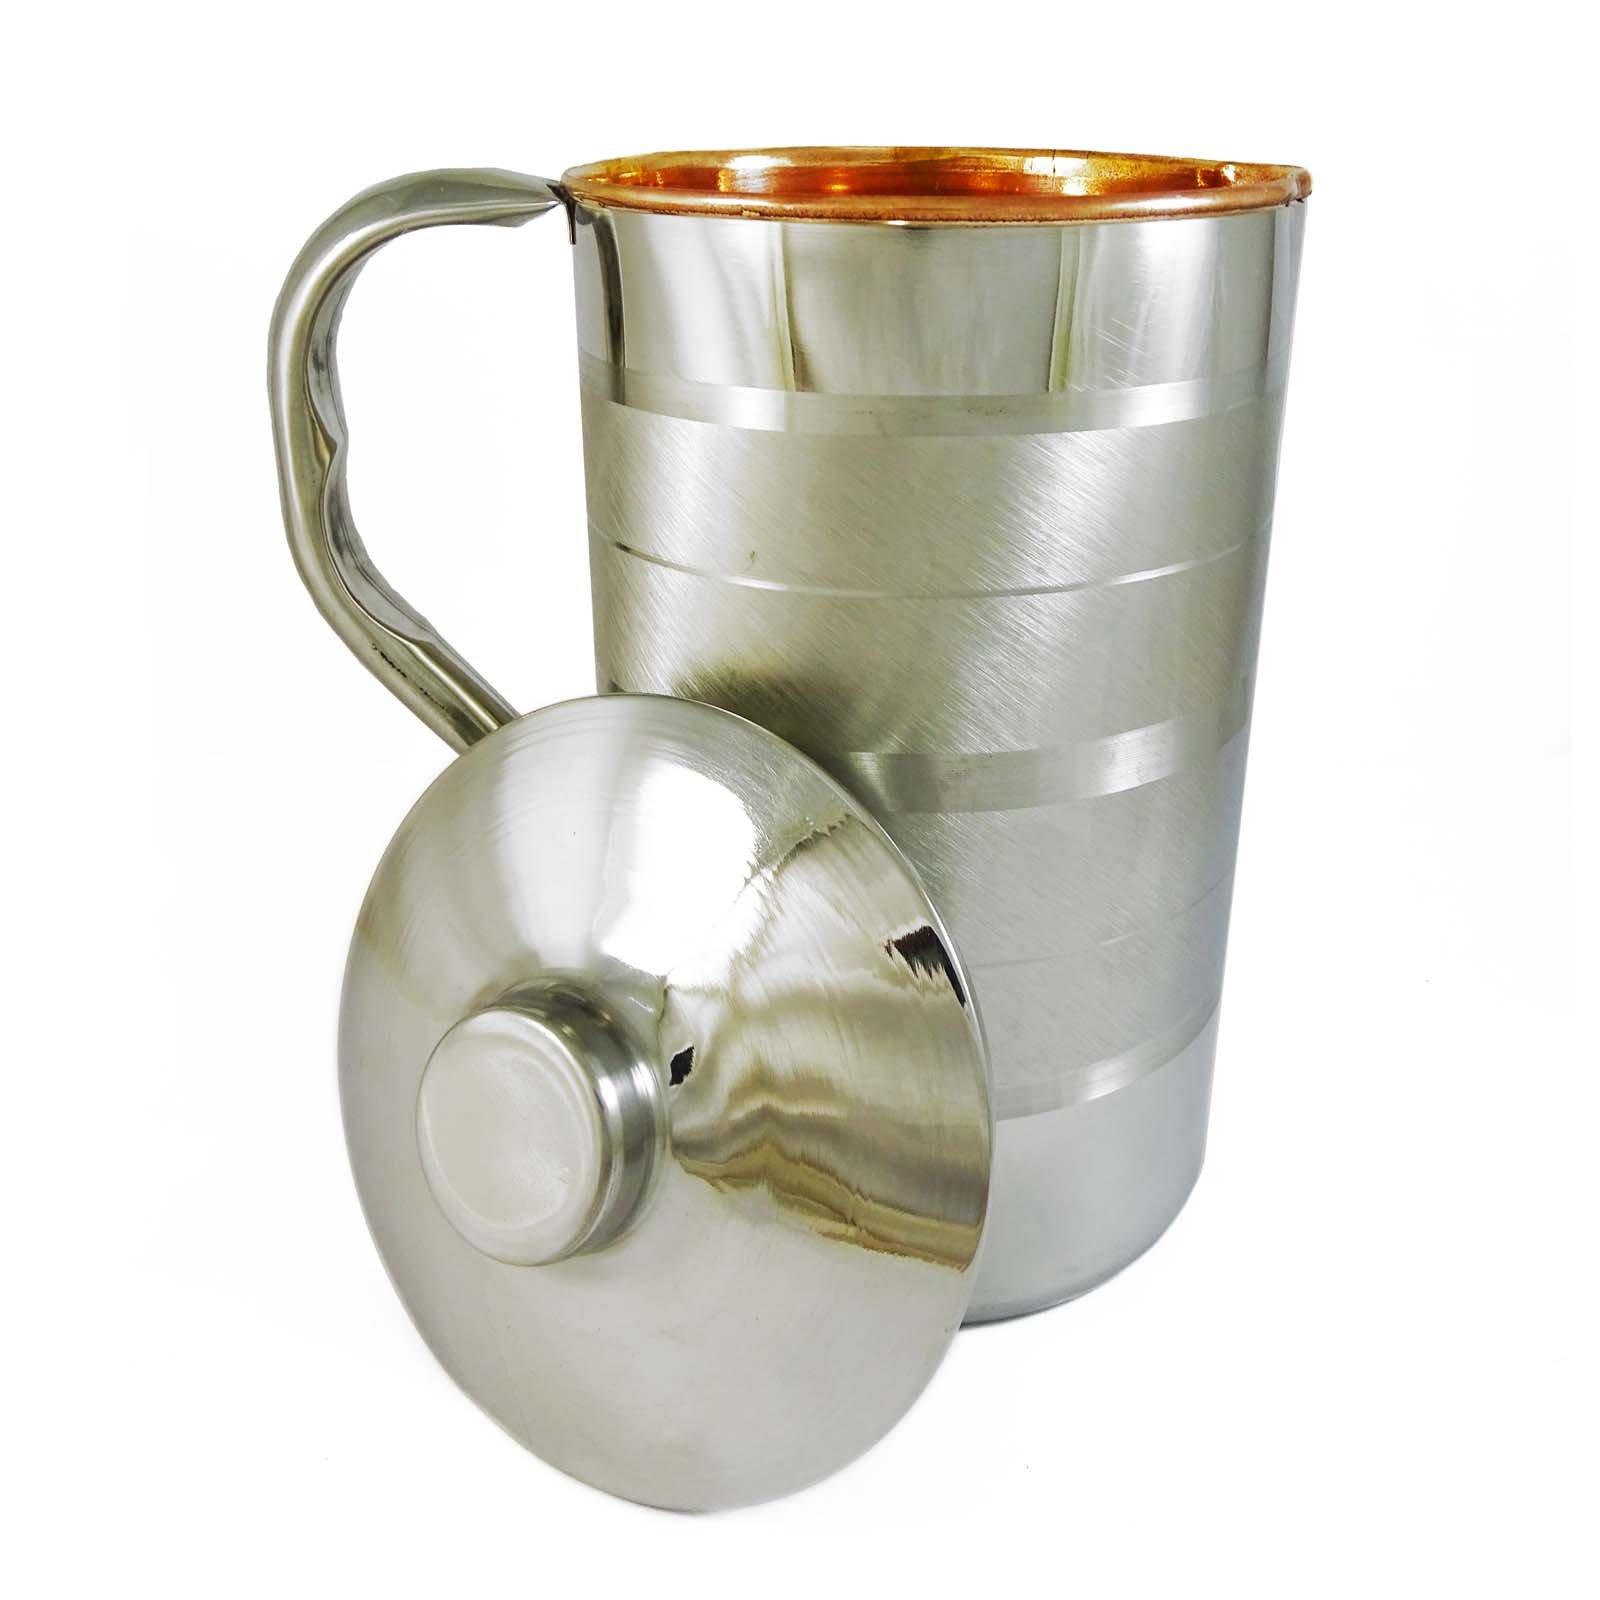 ibaexports Tableware Traditional Serving Ayurvedic Copper Steel Kitchenware Water Jug